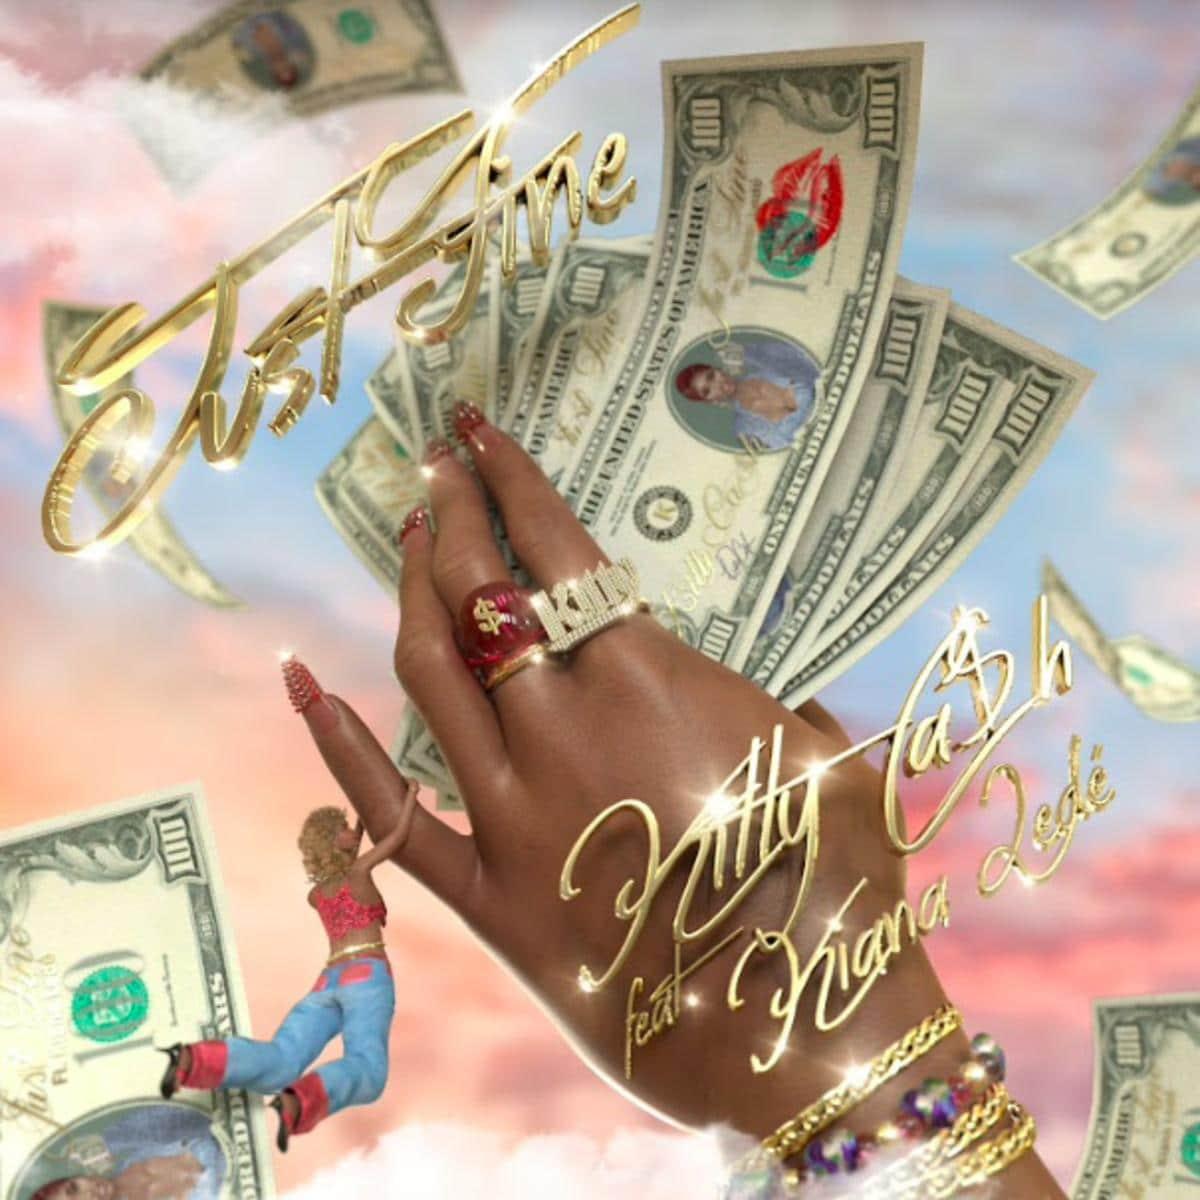 Kitty Cash Ft. Kiana Ledé - Just Fine Mp3